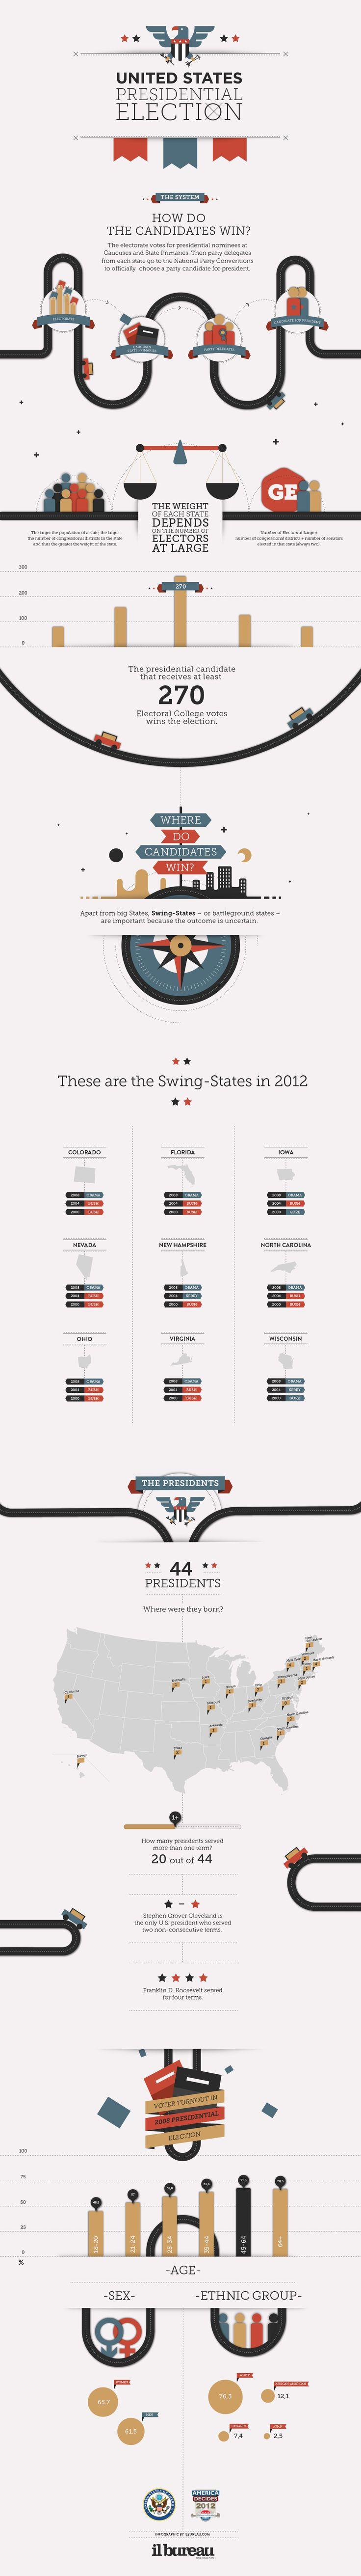 il Bureau - #Presidential #Election - #infographic